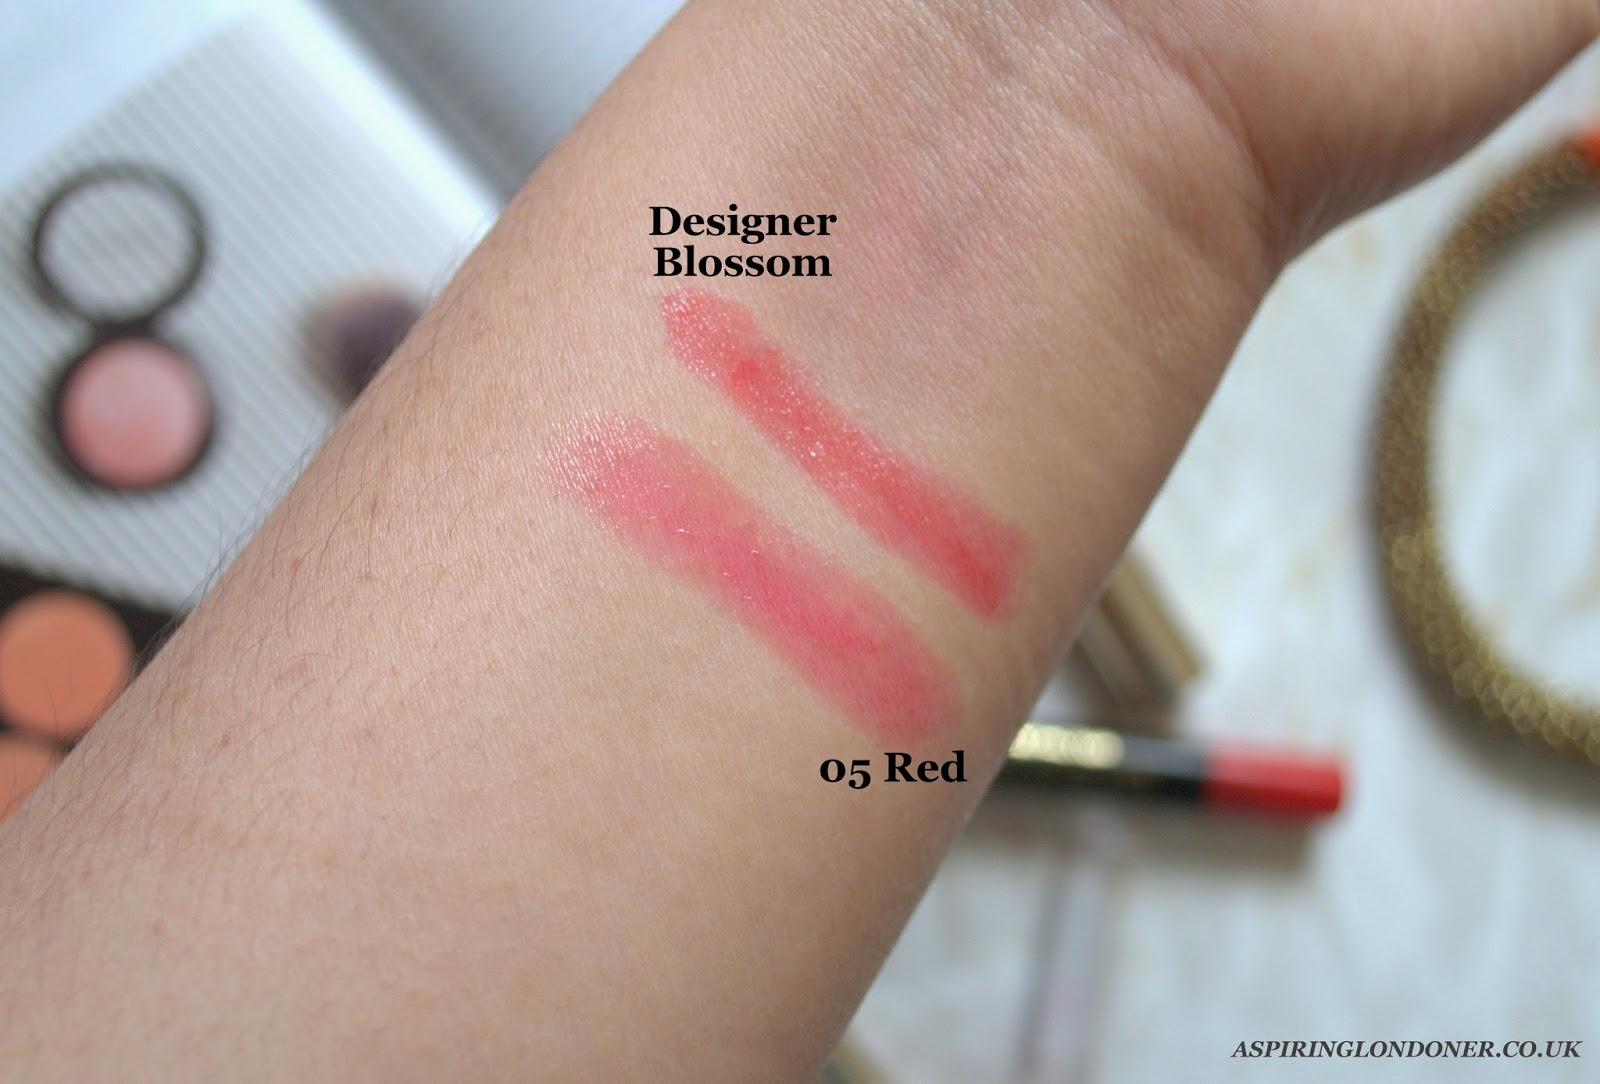 Max Factor Colour Elixir Giant Pen Stick in Designer Blossom Review Swatch - Aspiring Londoner